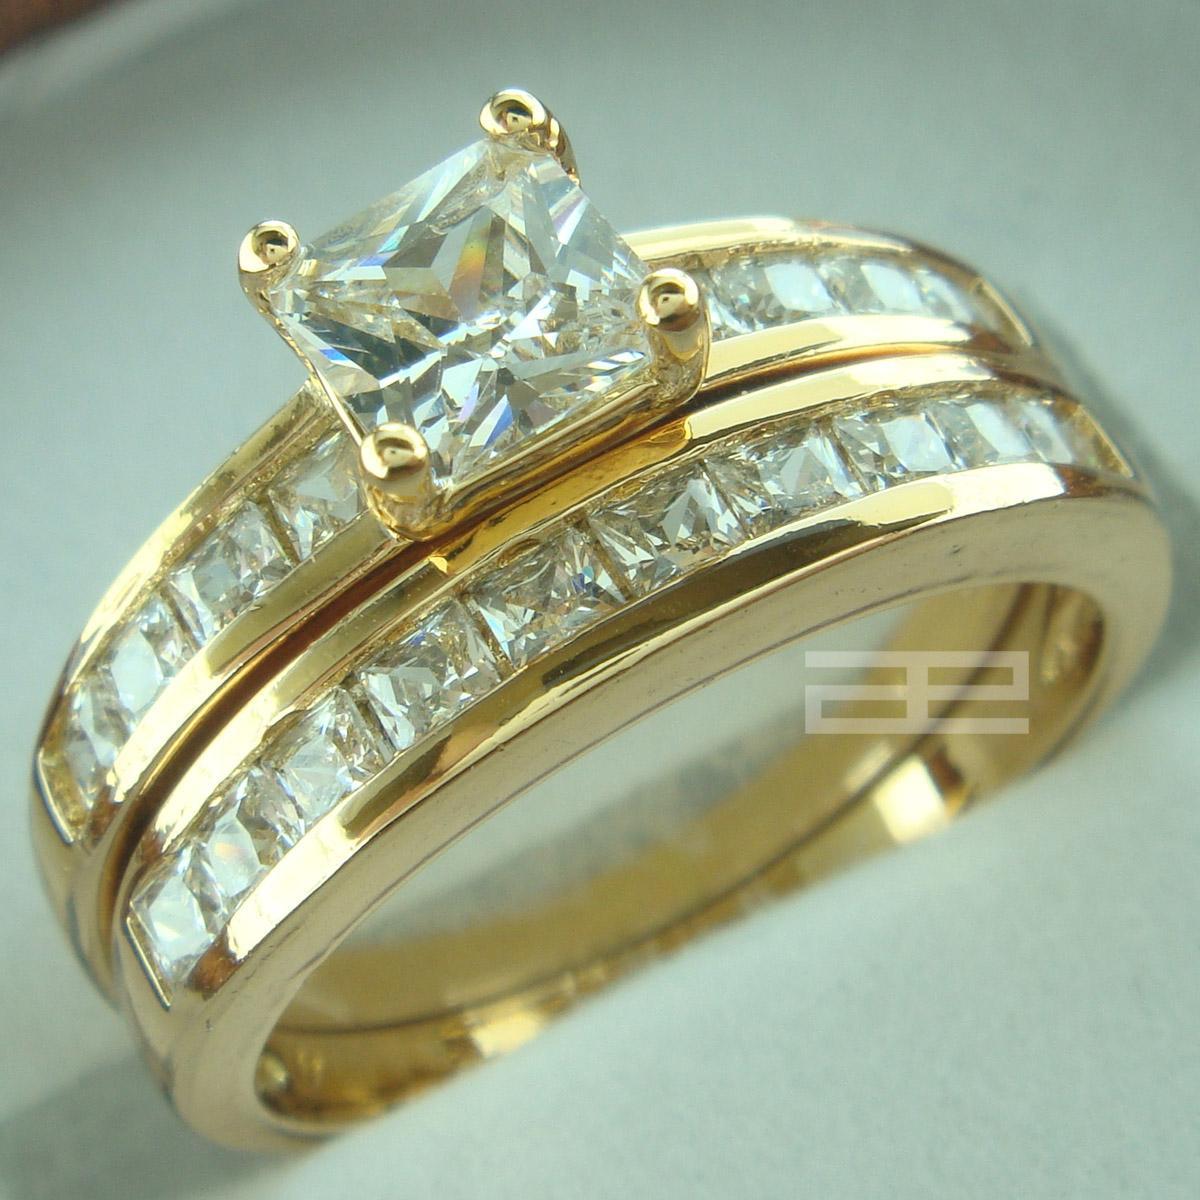 18k yellow gold gf womens engagement wedding ring set lab diamonds